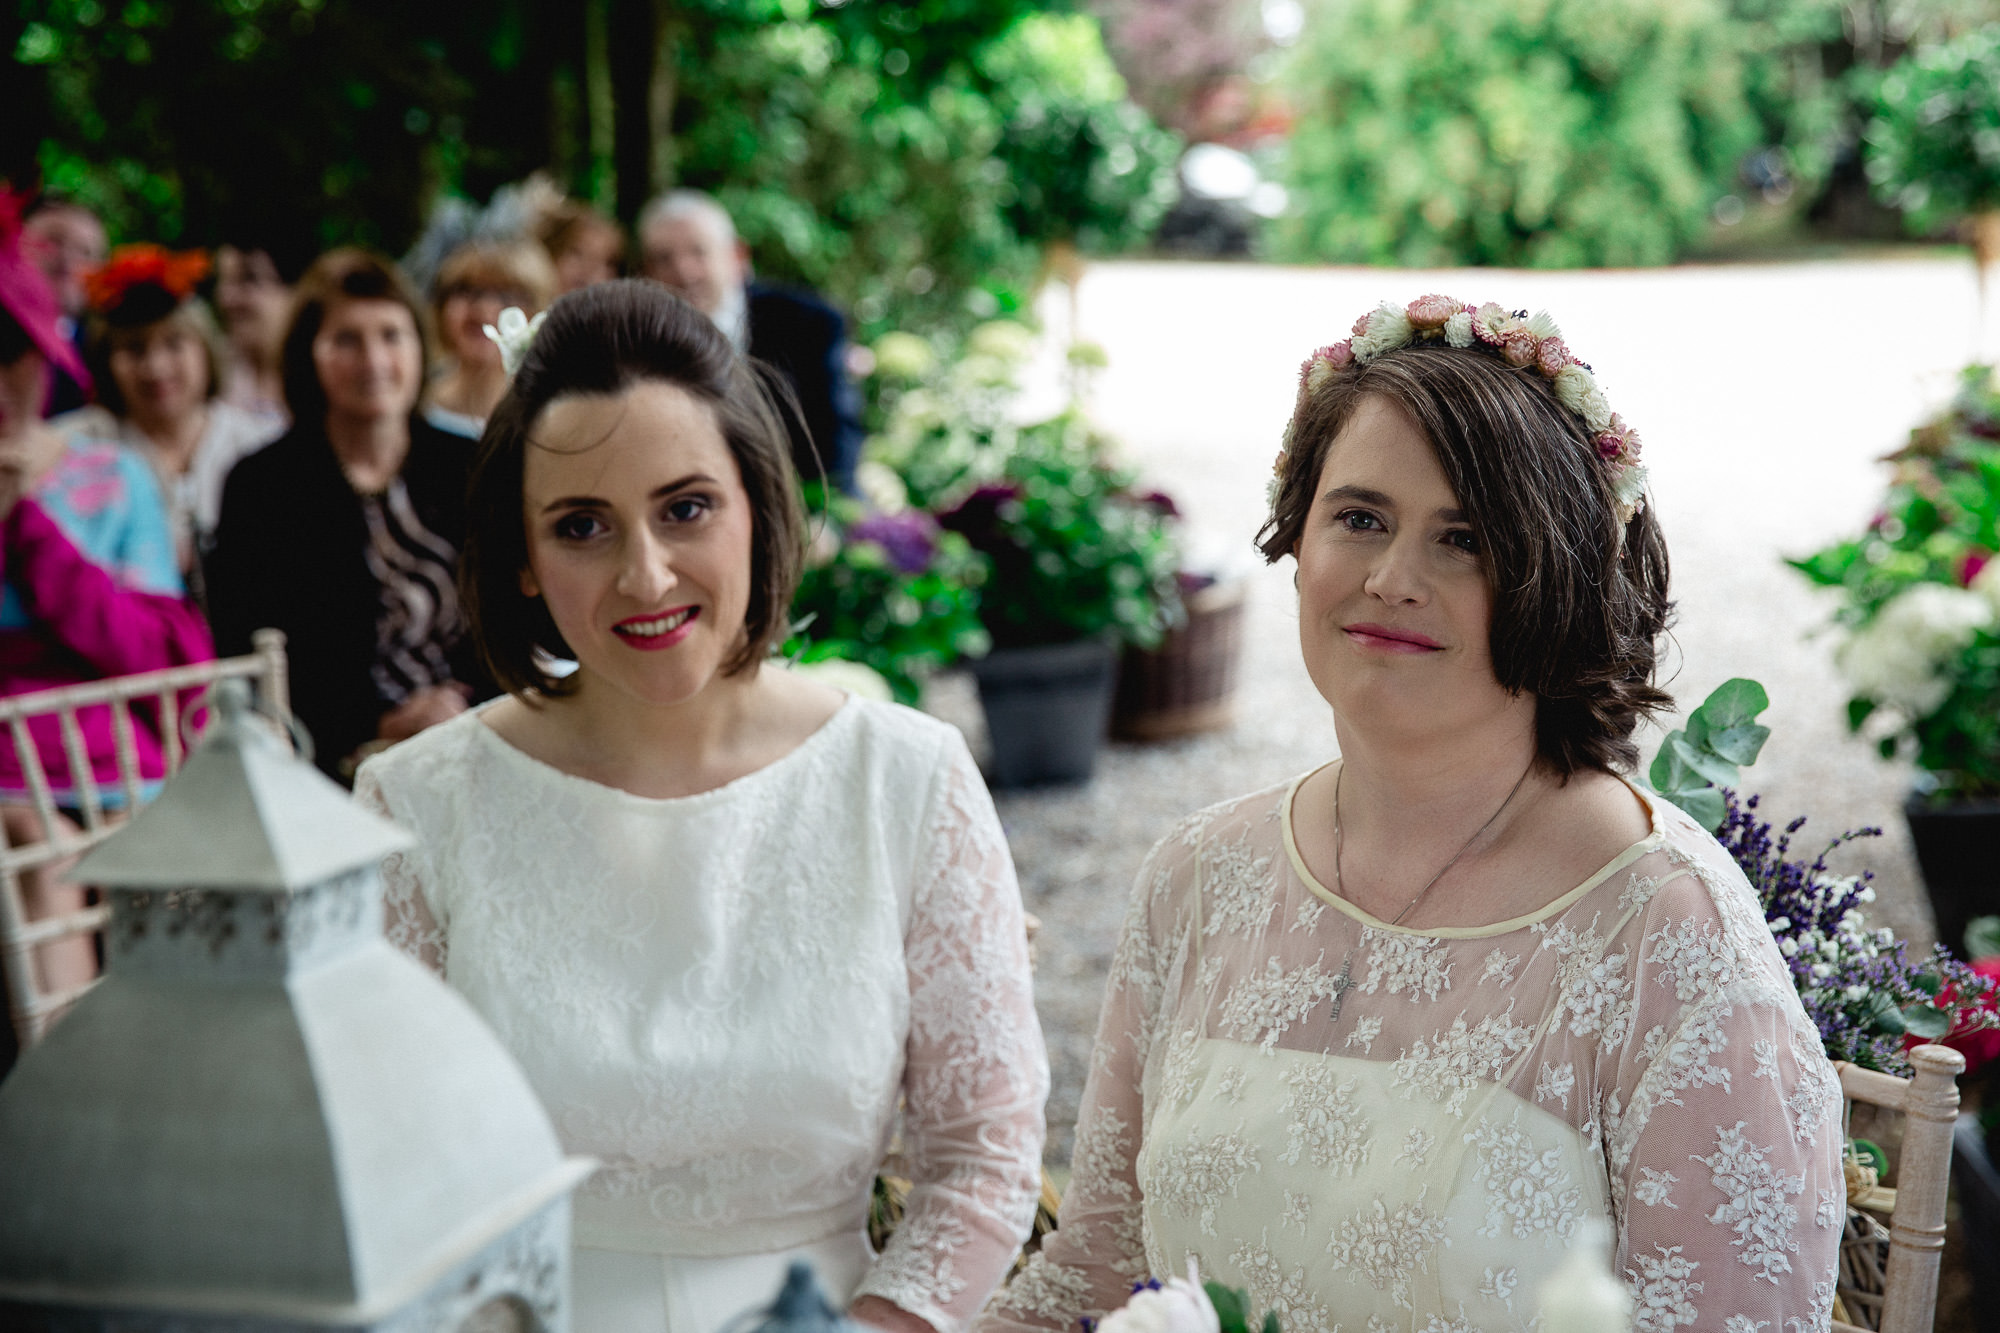 CLAIREBYRNEPHOTOGRAPHY-WEDDING-Ireland-cloncody-alternative-fun-Jen-Helena-1.jpg